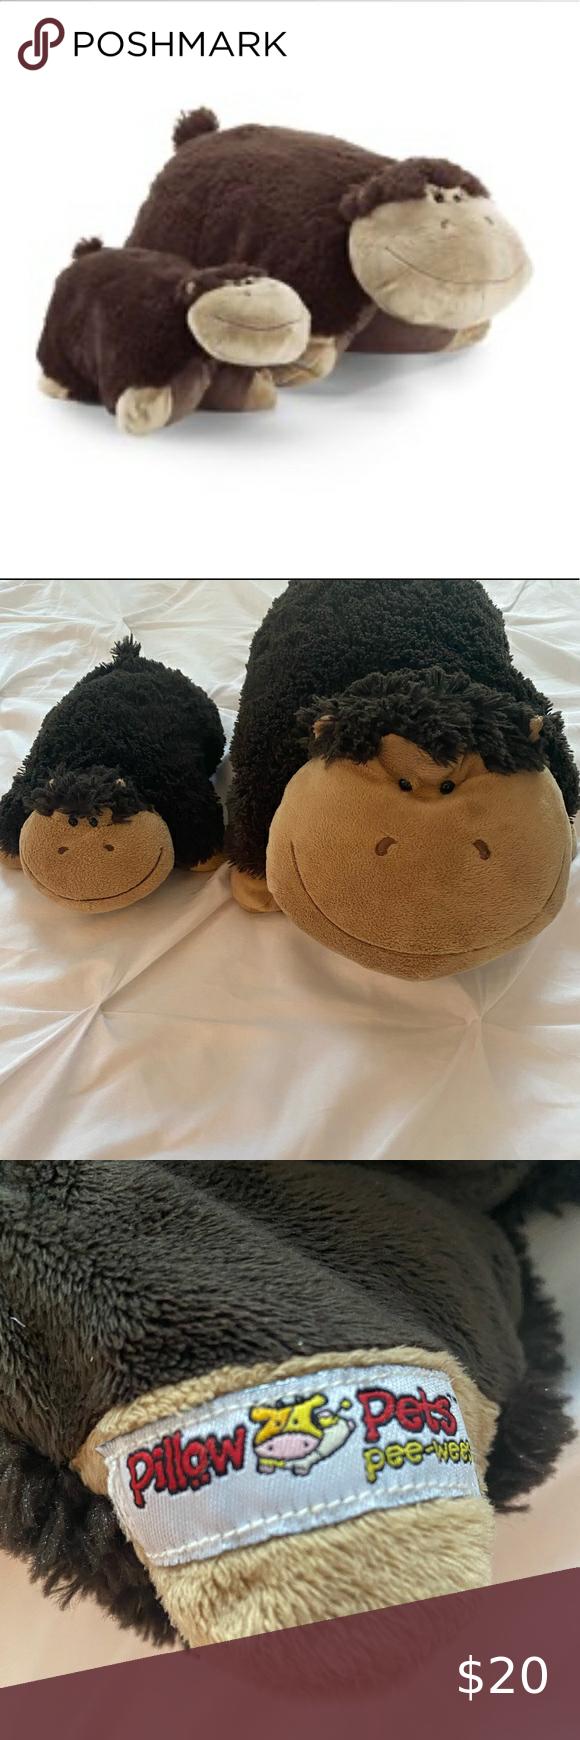 animal pillows monkey plush monkey pillow